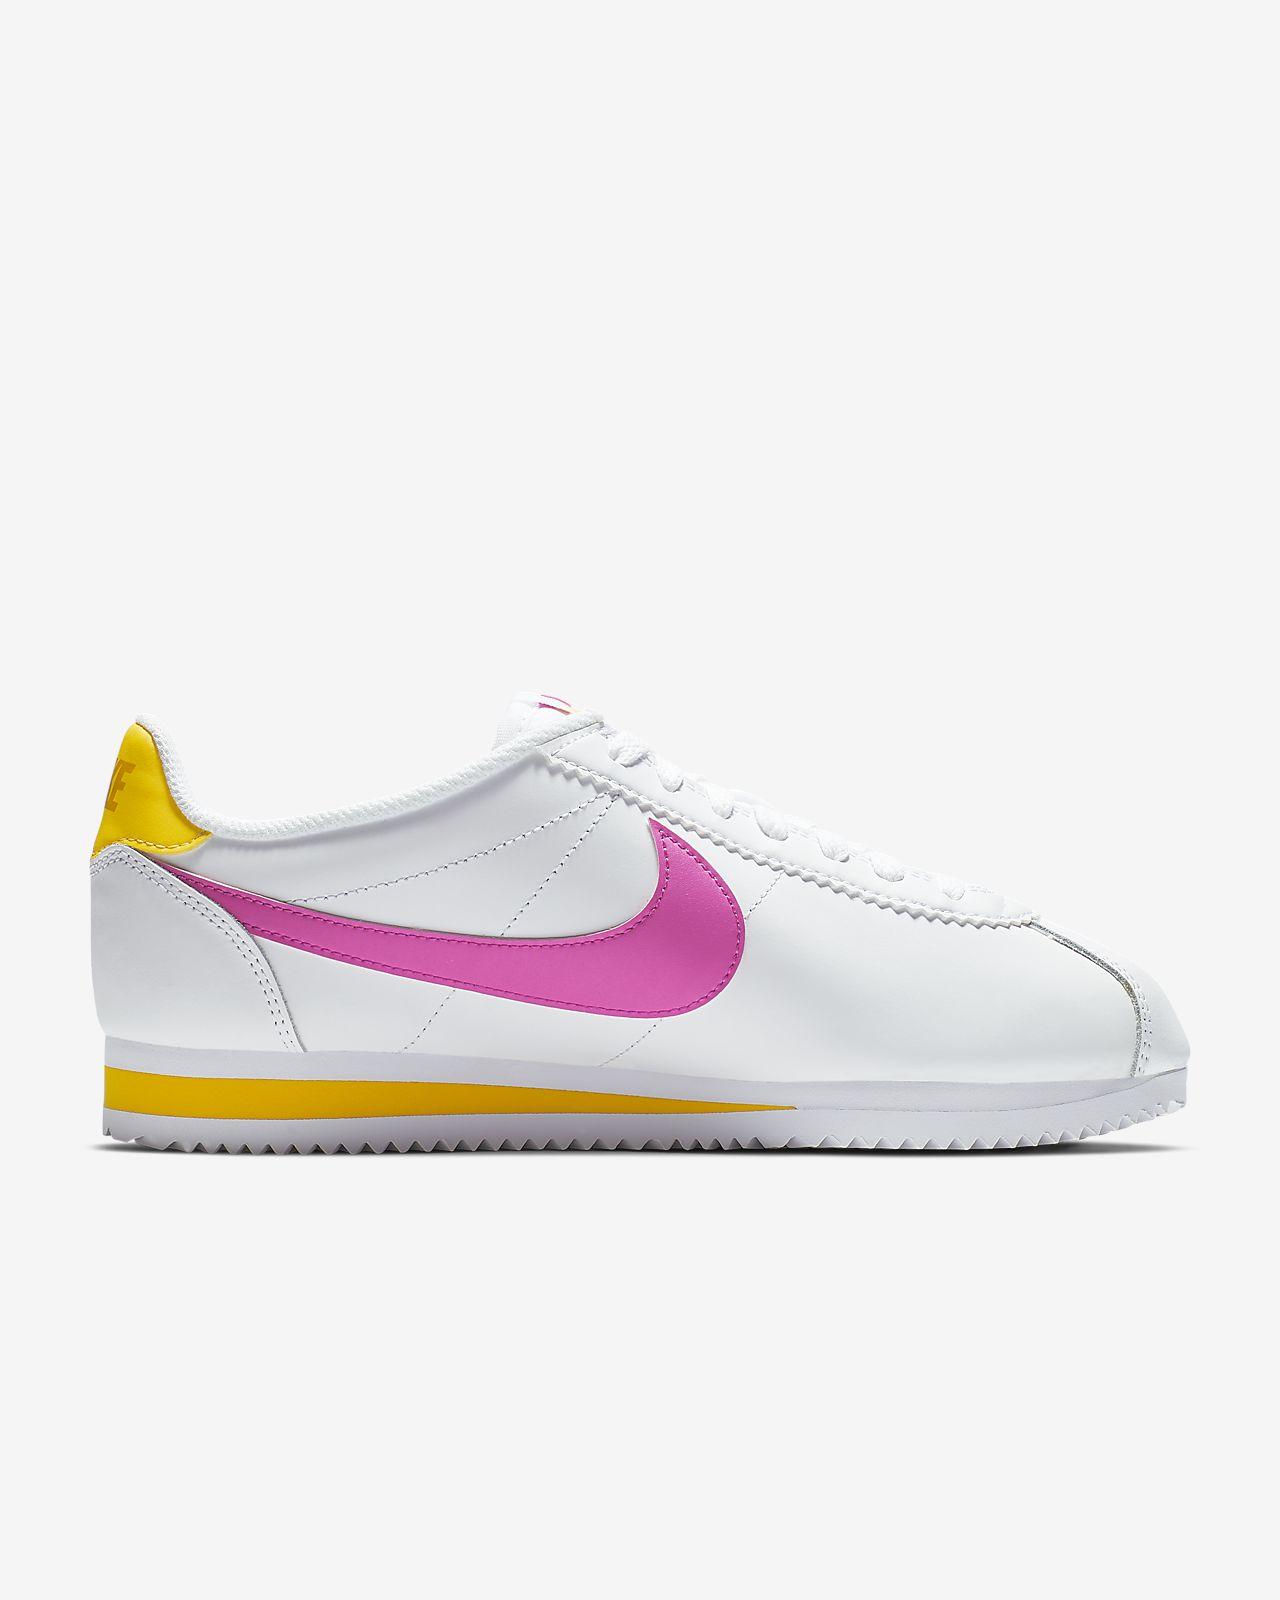 494aa34034f Nike Classic Cortez Zapatillas - Mujer. Nike.com ES